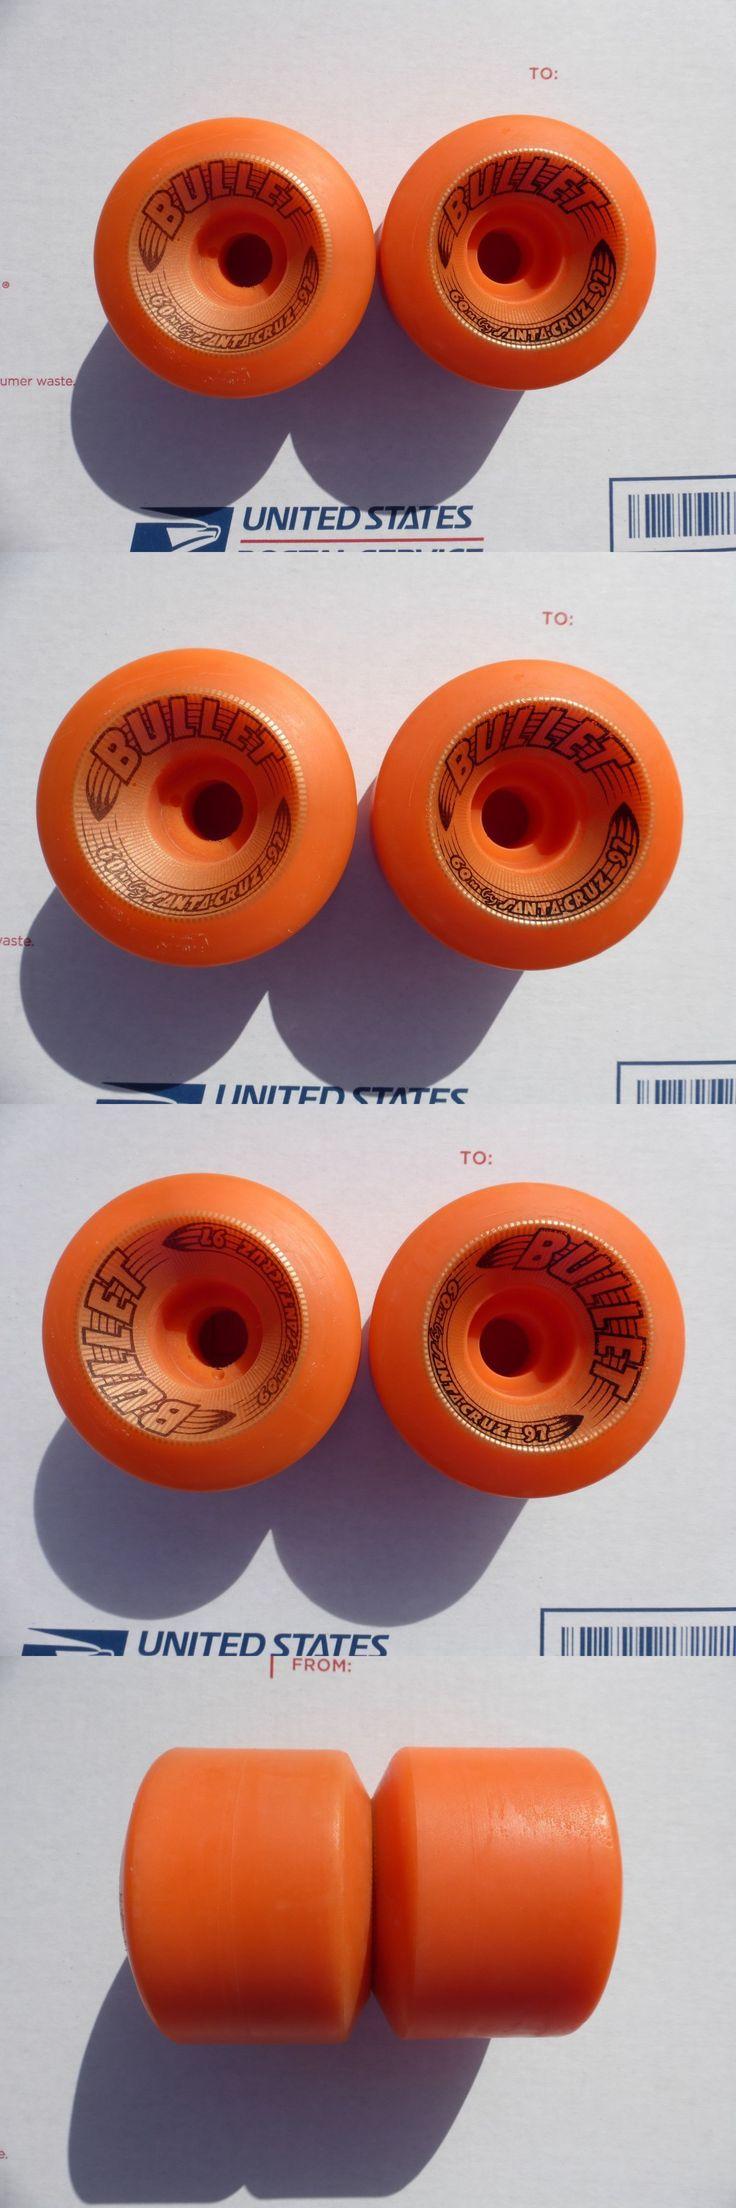 Decks 16263: Santa Cruz Bullet Vintage Skateboard Wheels, 2 Only BUY IT NOW ONLY: $65.0